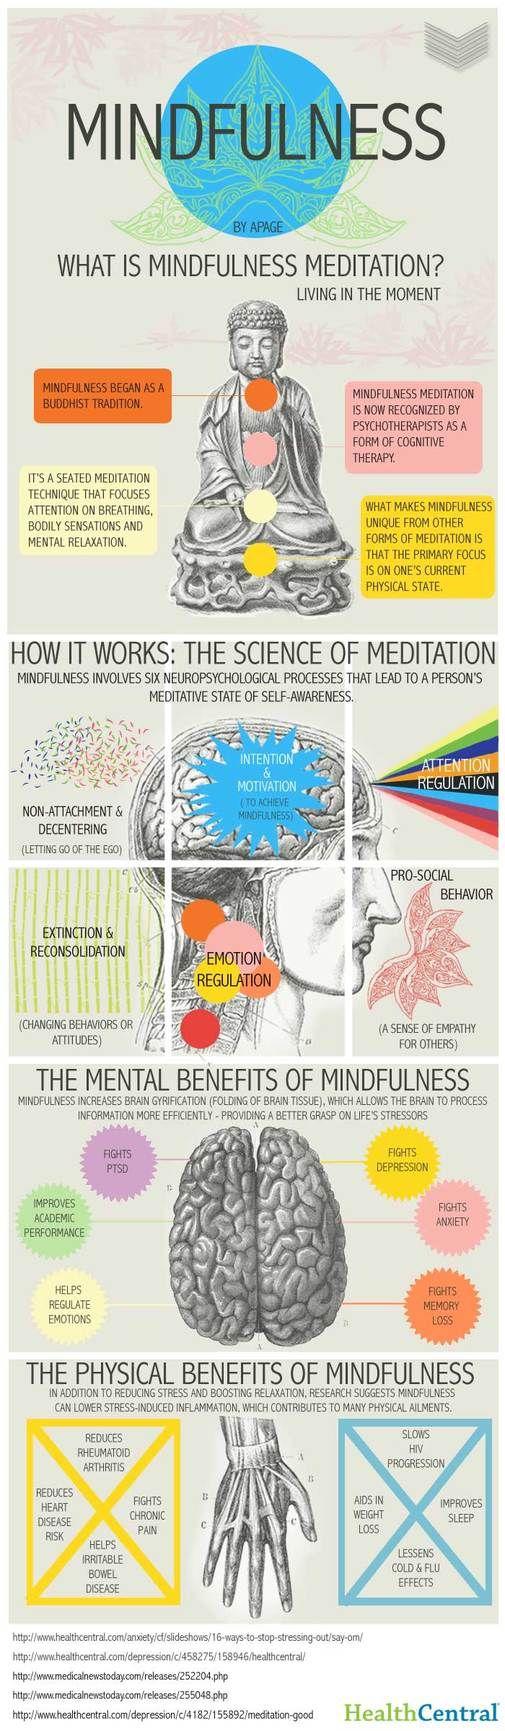 Mindfulness Meditation Infographic